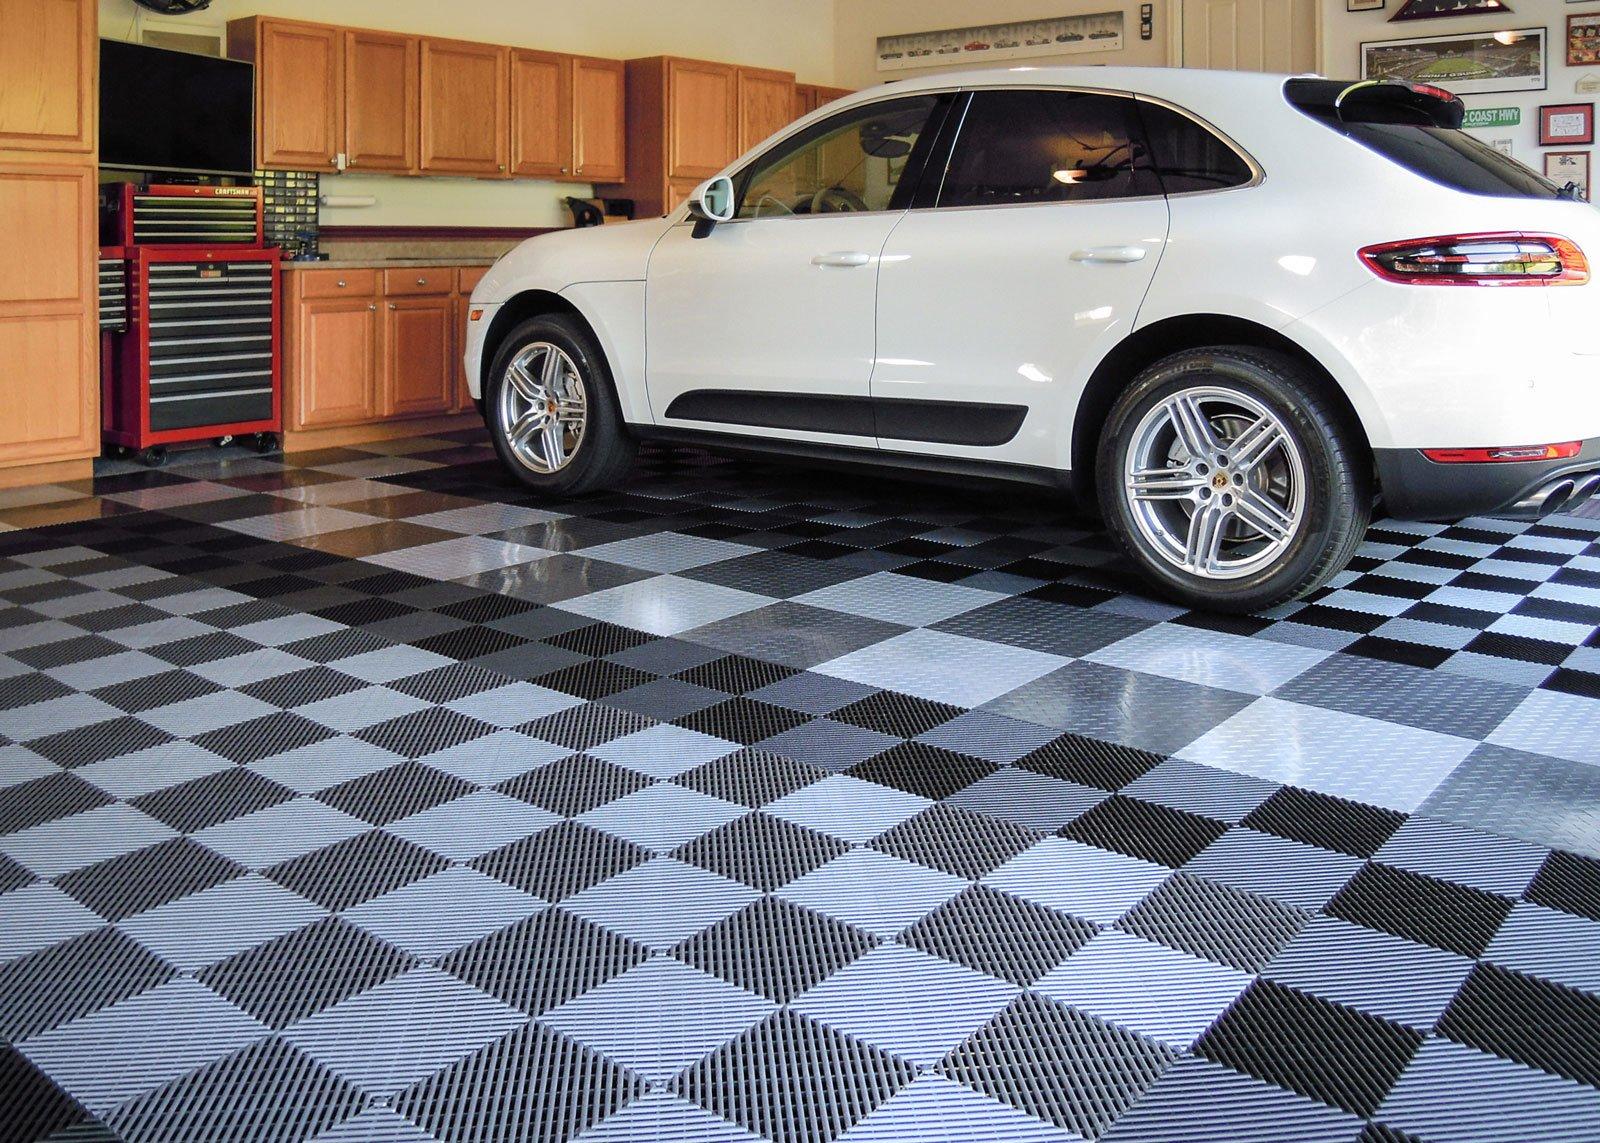 RaceDeck Free-Flow Open Rib Design, Durable Interlocking Modular Garage Flooring Tile (48 Pack), Graphite by RaceDeck (Image #2)